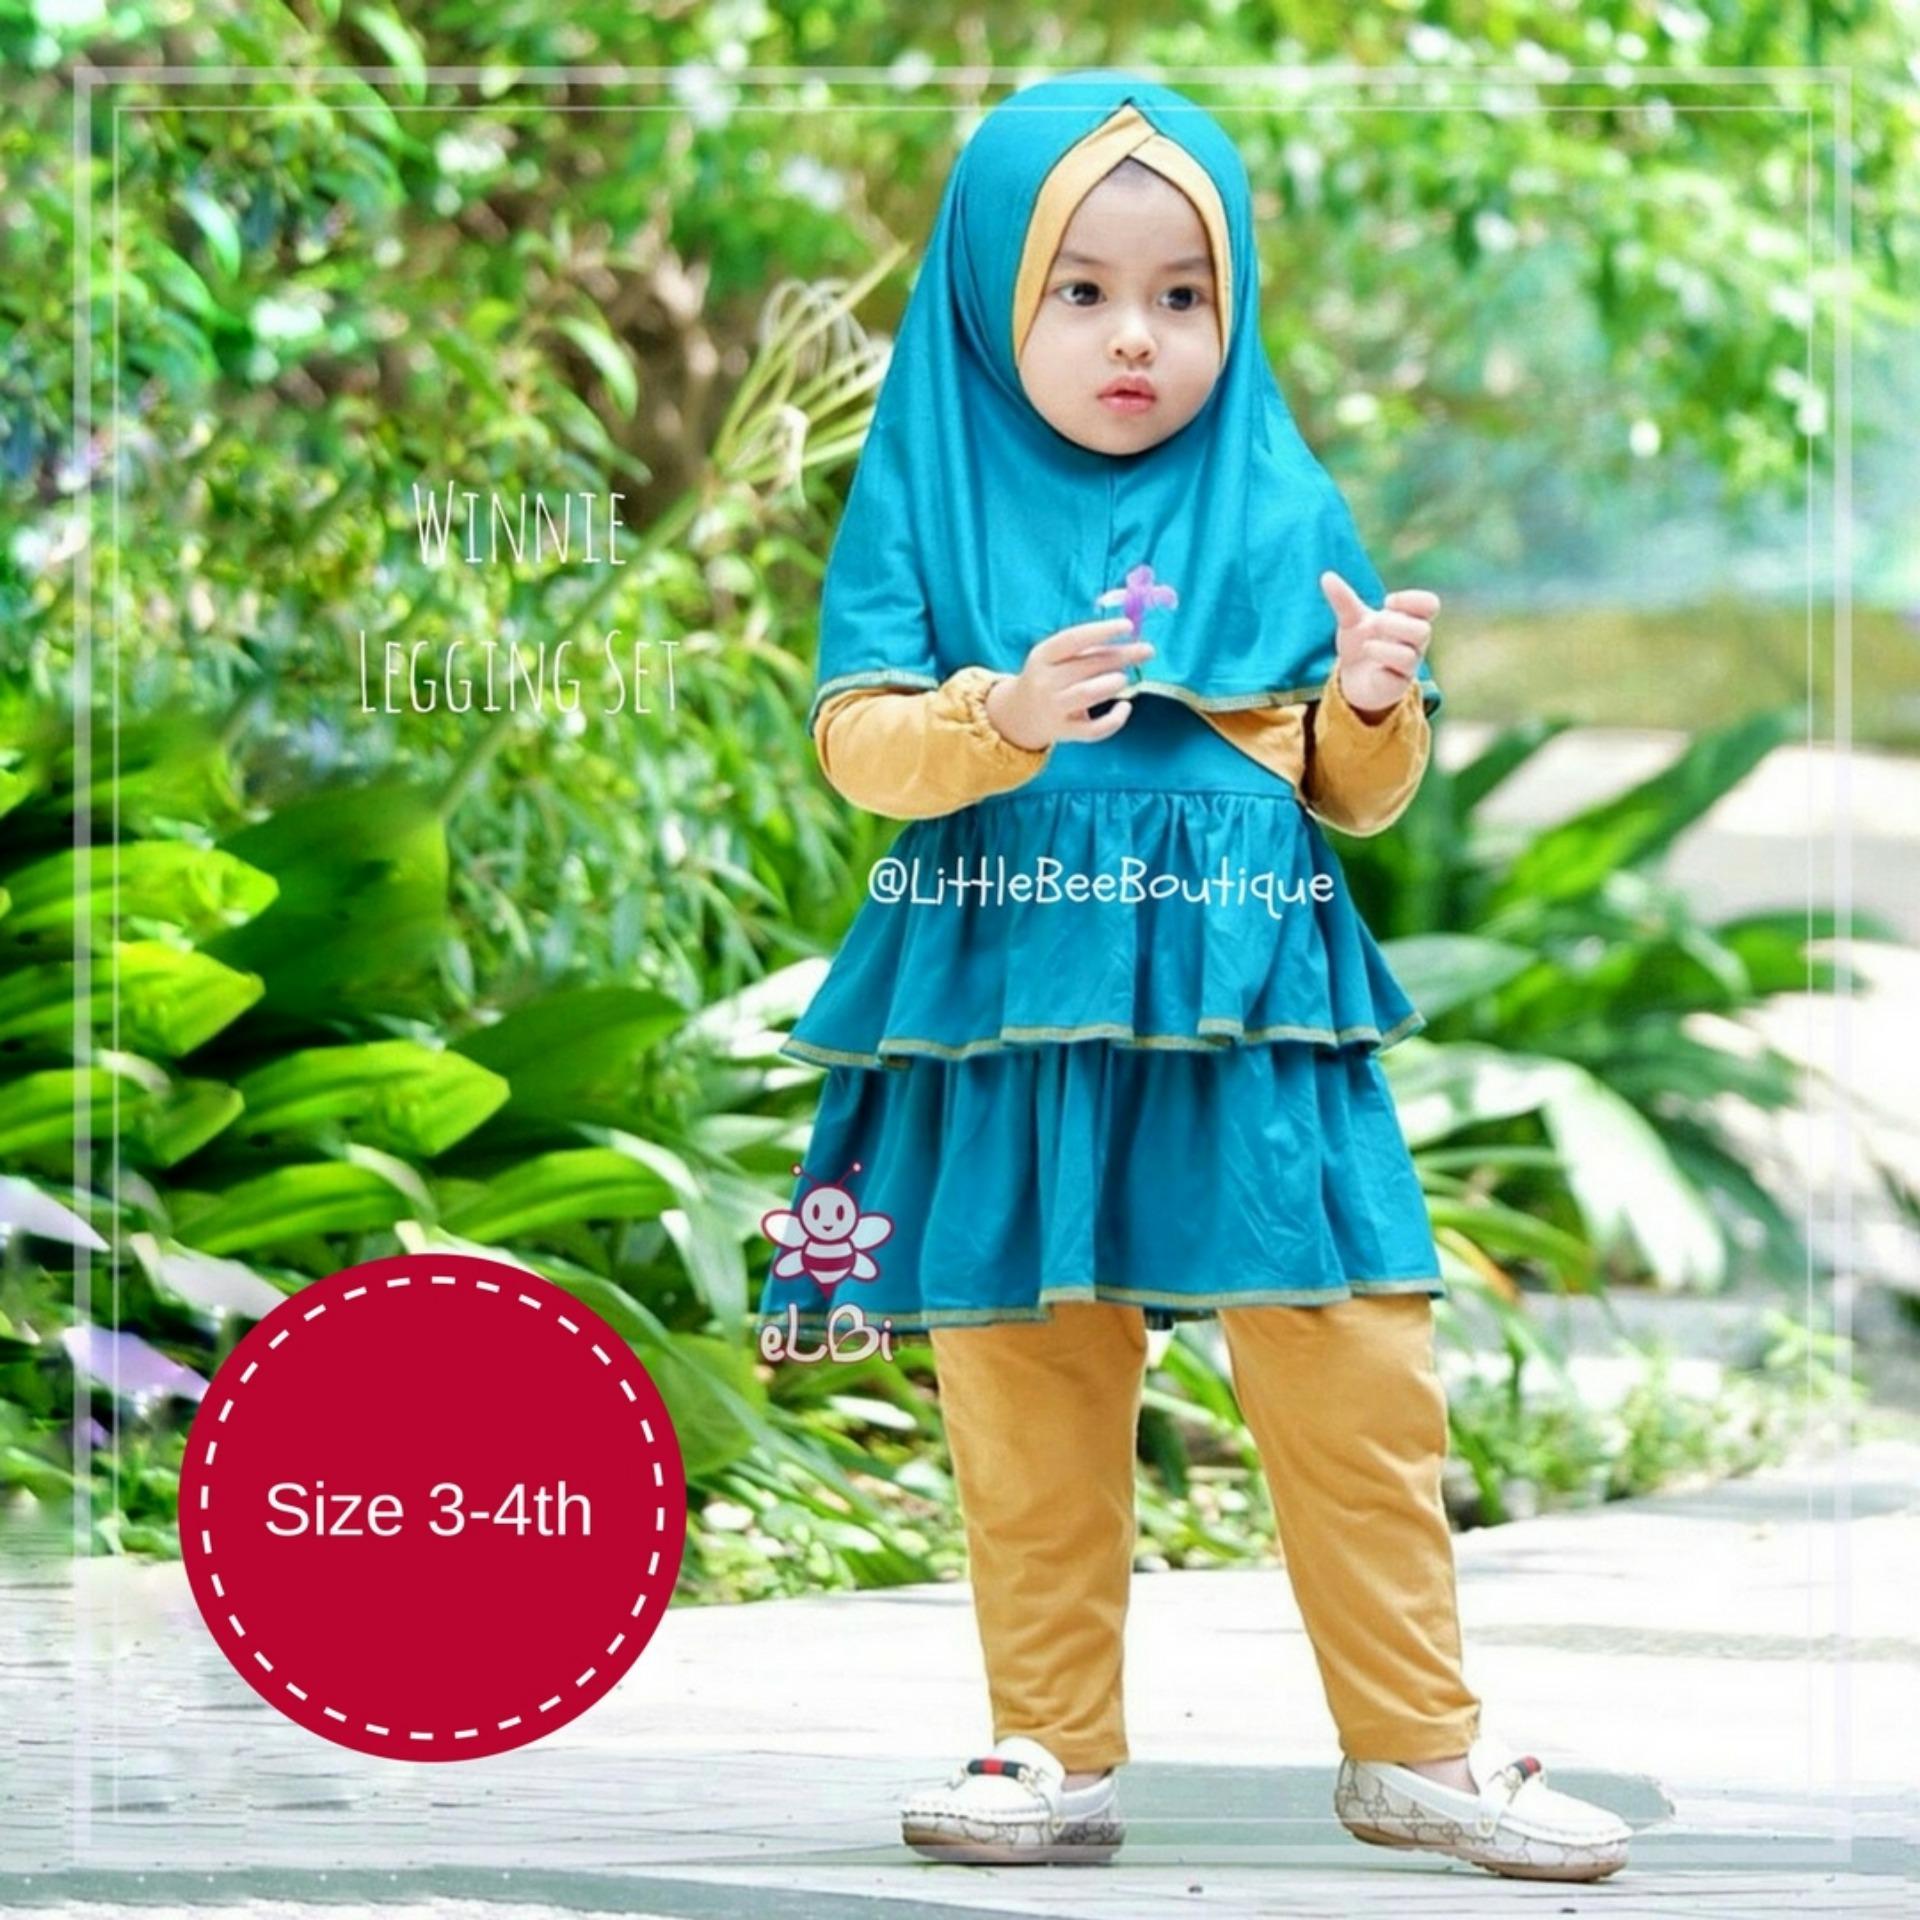 eLBi Winnie Legging Set / Baju Muslim Balita / Baju Muslim Bayi Perempuan / Baju Bayi Perempuan / Baju Anak Perempuan by Little Bee Boutique